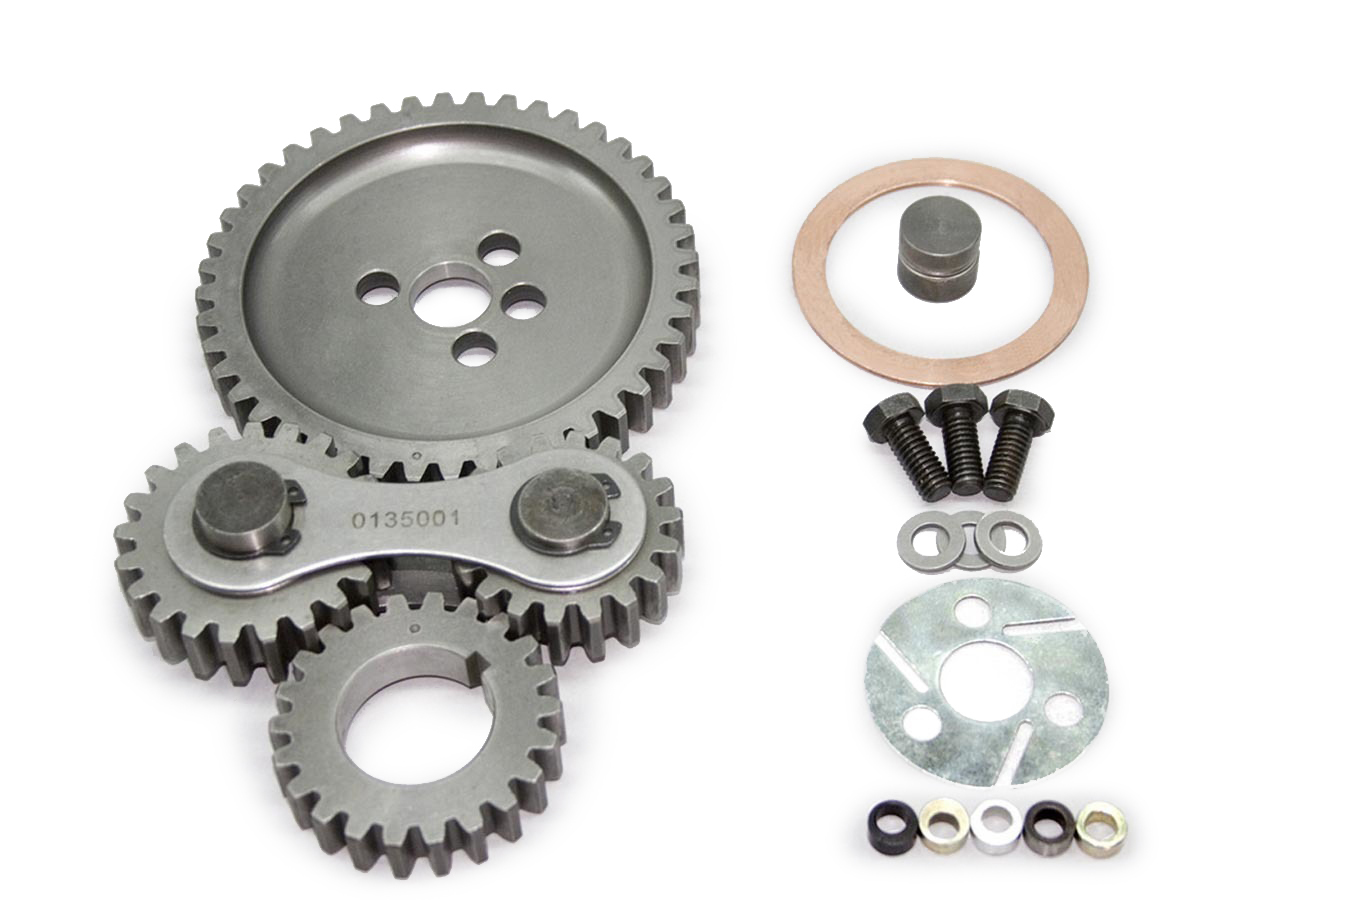 PRW Industries 0135002 Timing Gear Drive, Dual Gear, Dual Idler, Quiet, Steel, Small Block Chevy, Kit